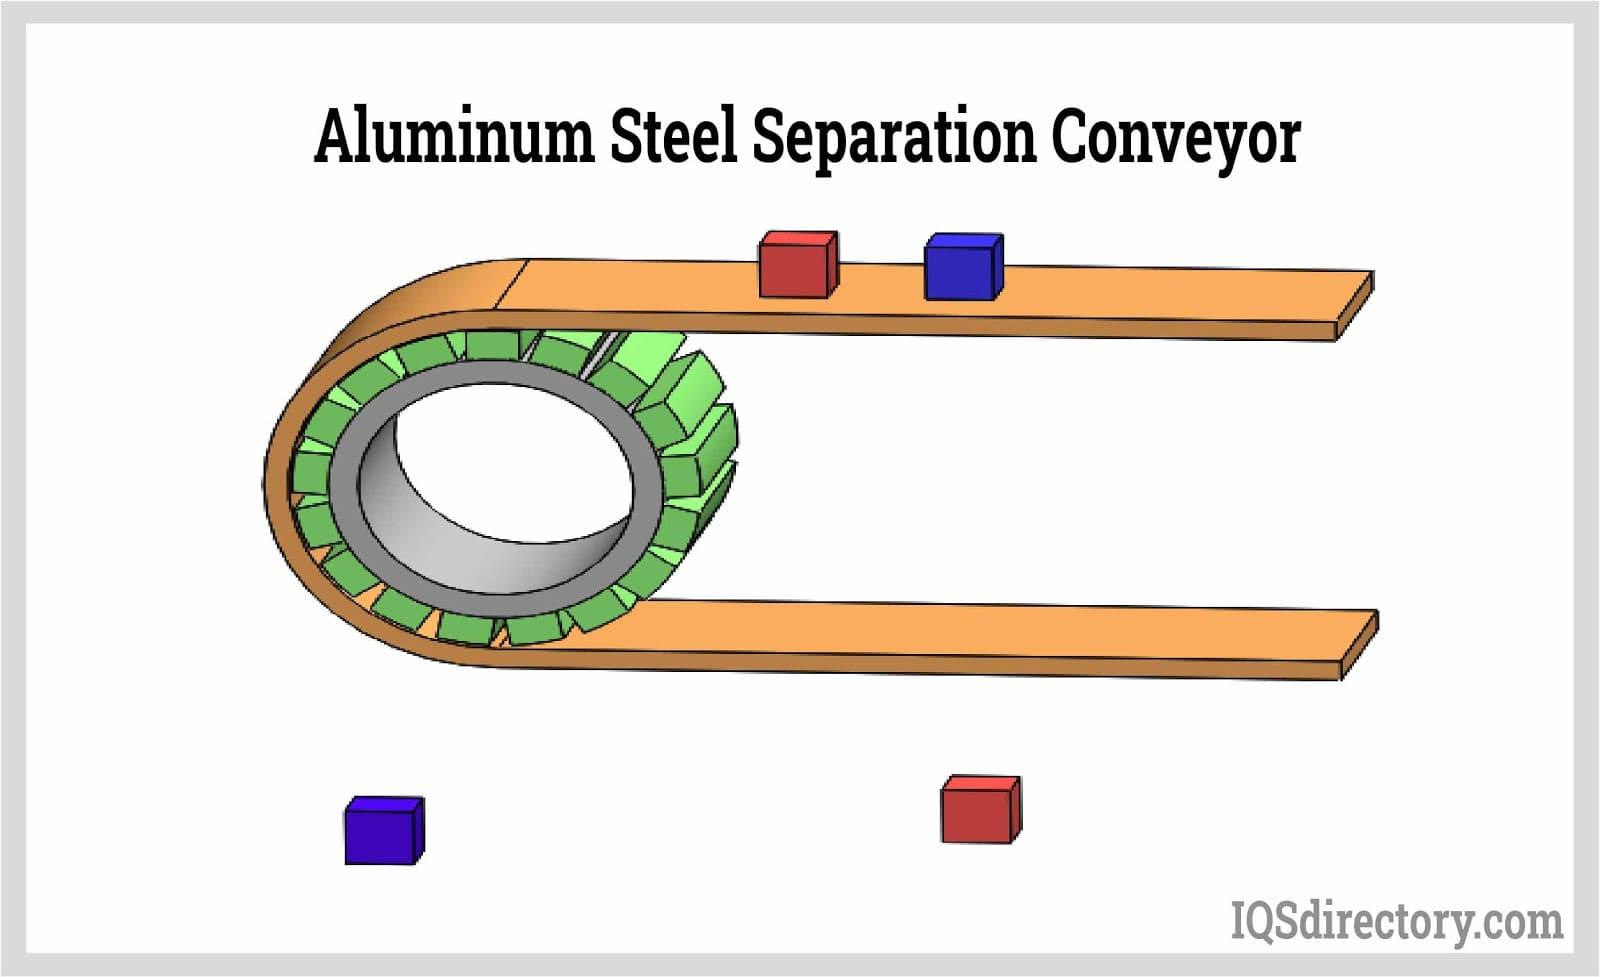 Aluminum Steel Separation Conveyor